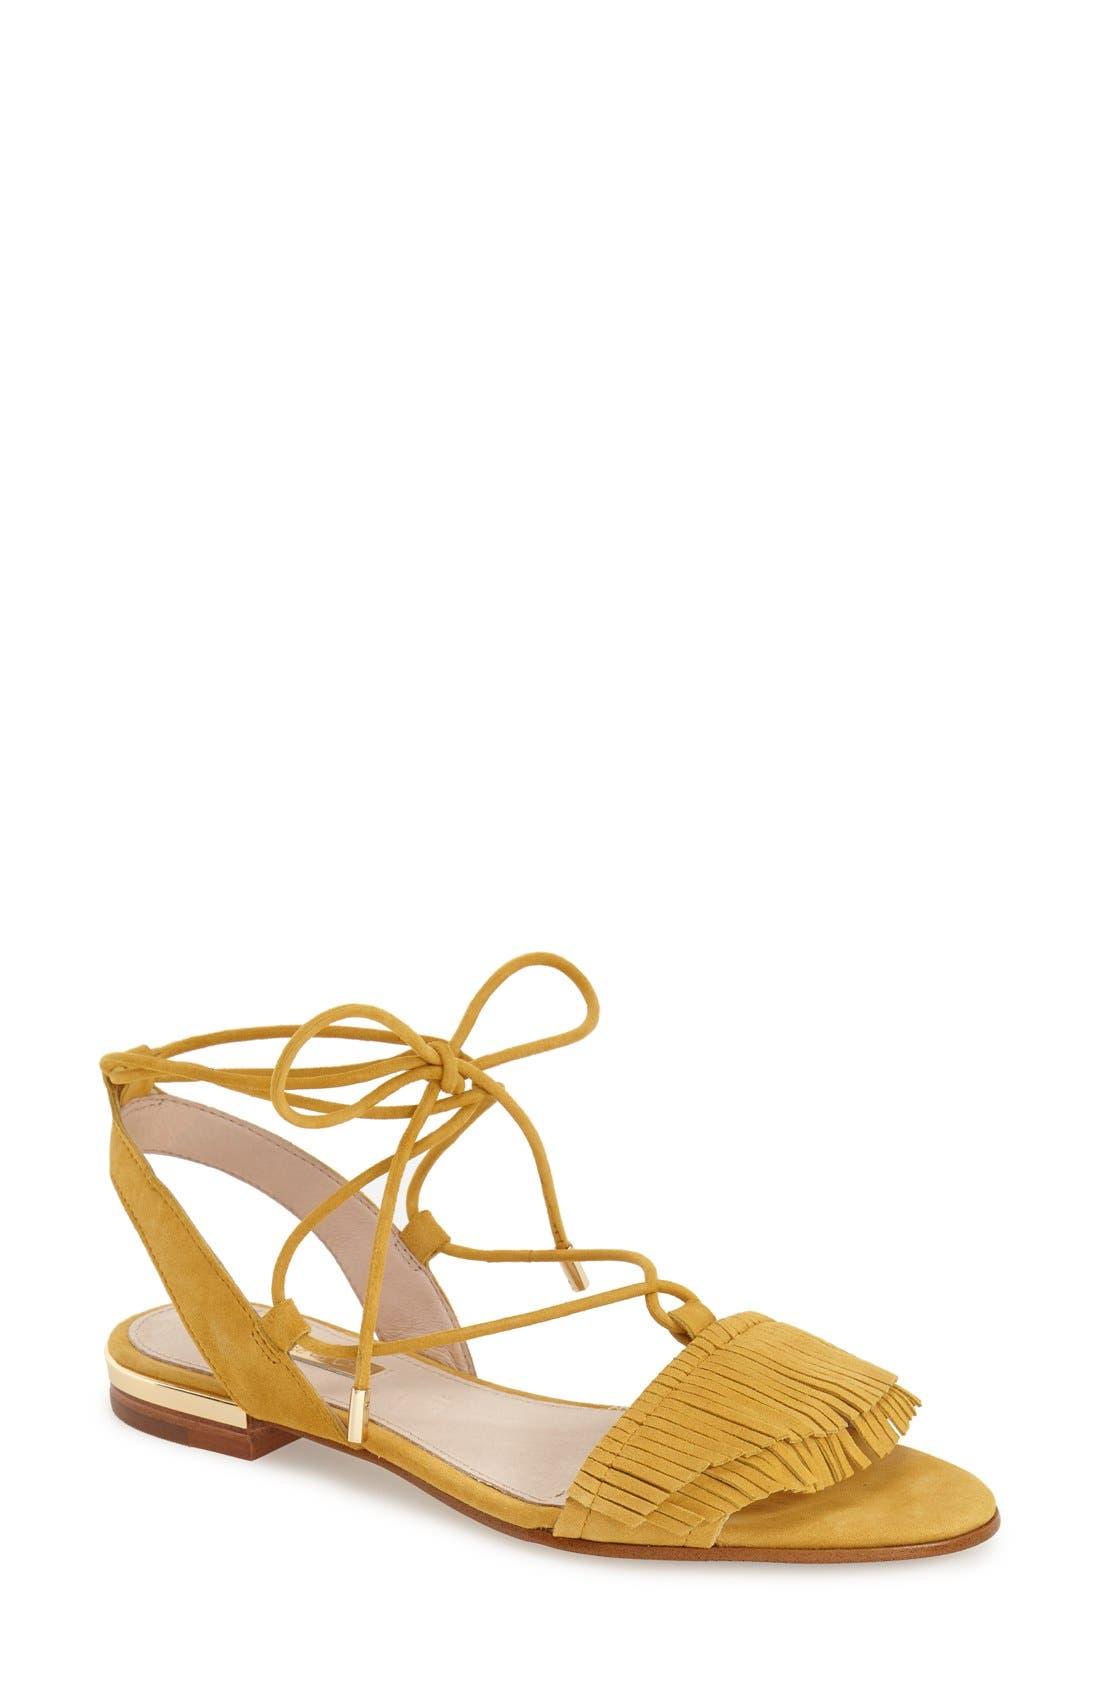 Main Image - Louise et Cie 'Cyan' Fringe Sandal (Women)